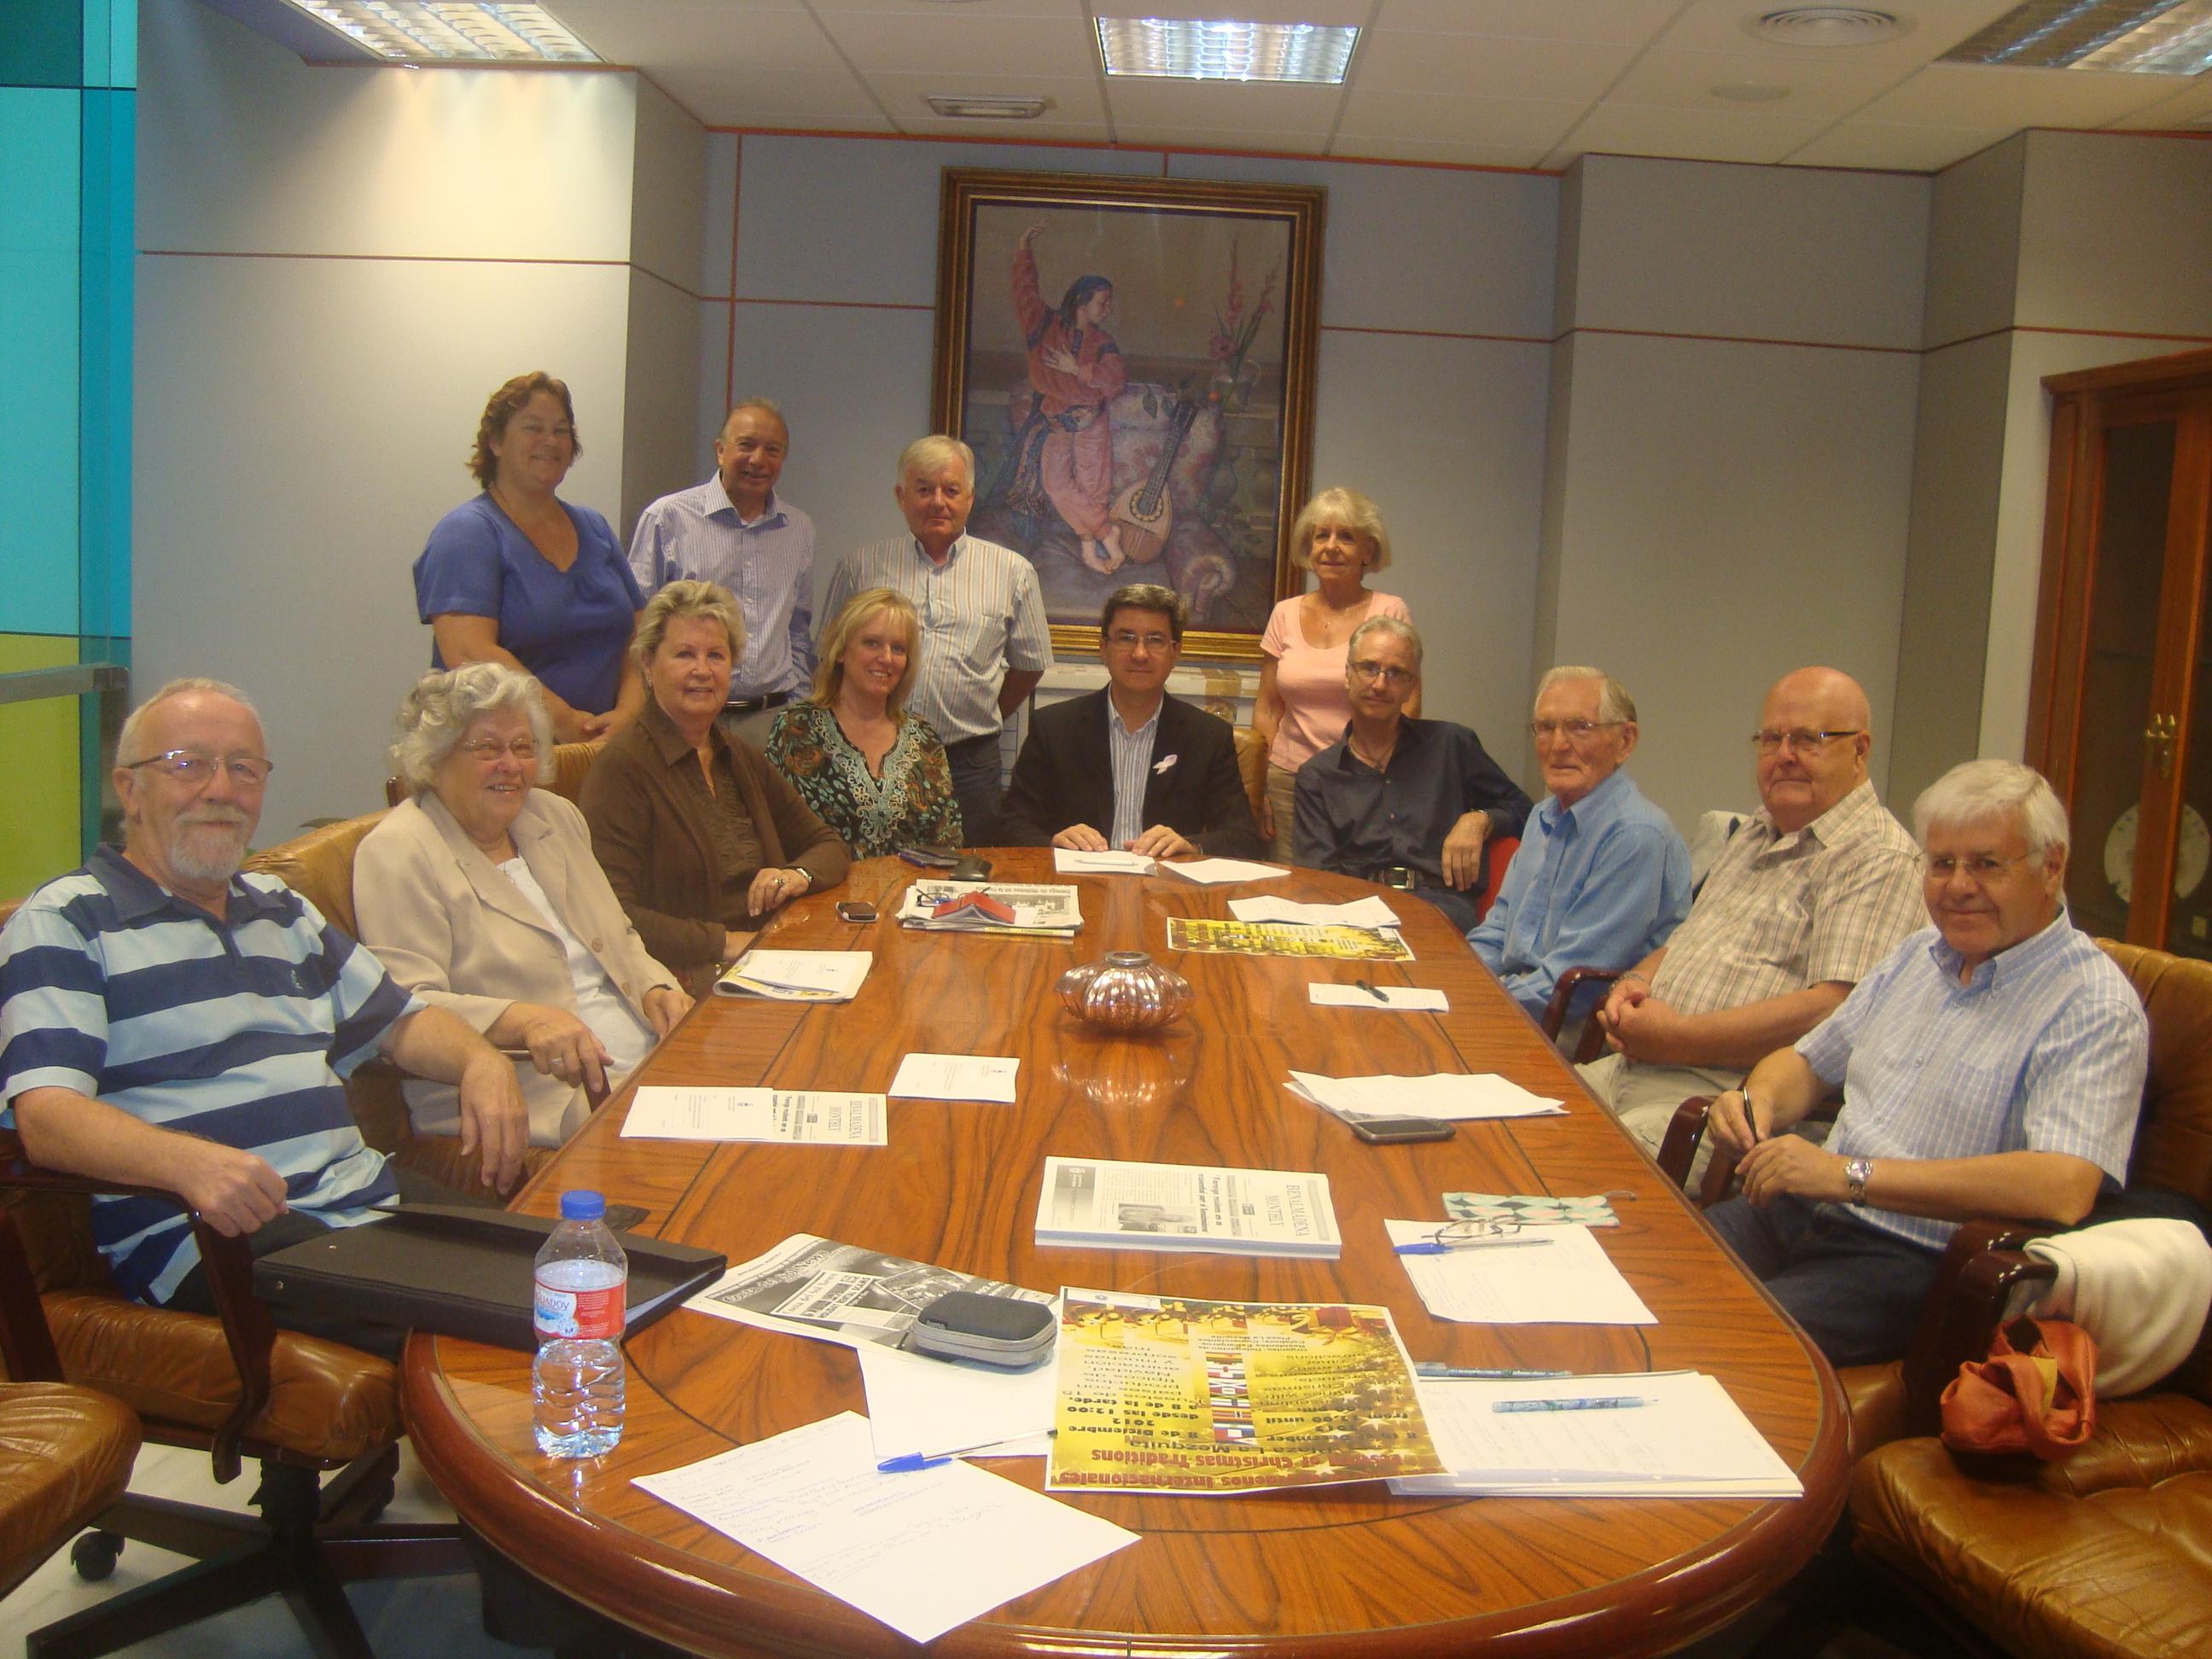 Empadronamiento benefits explained to representatives of fereign associations and clubs.